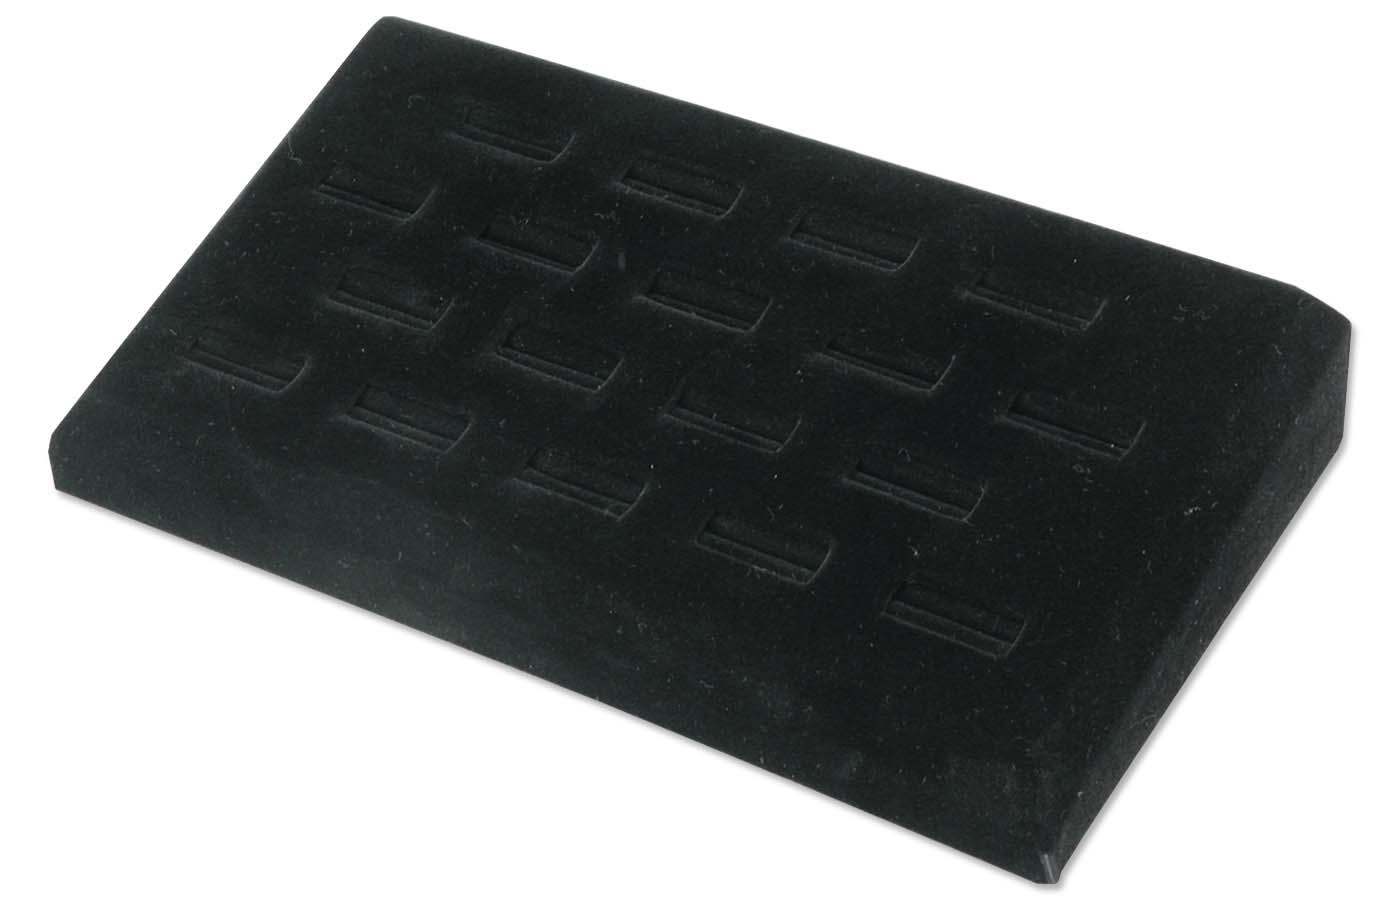 black velvet ring jewelry display tray for 18 rings